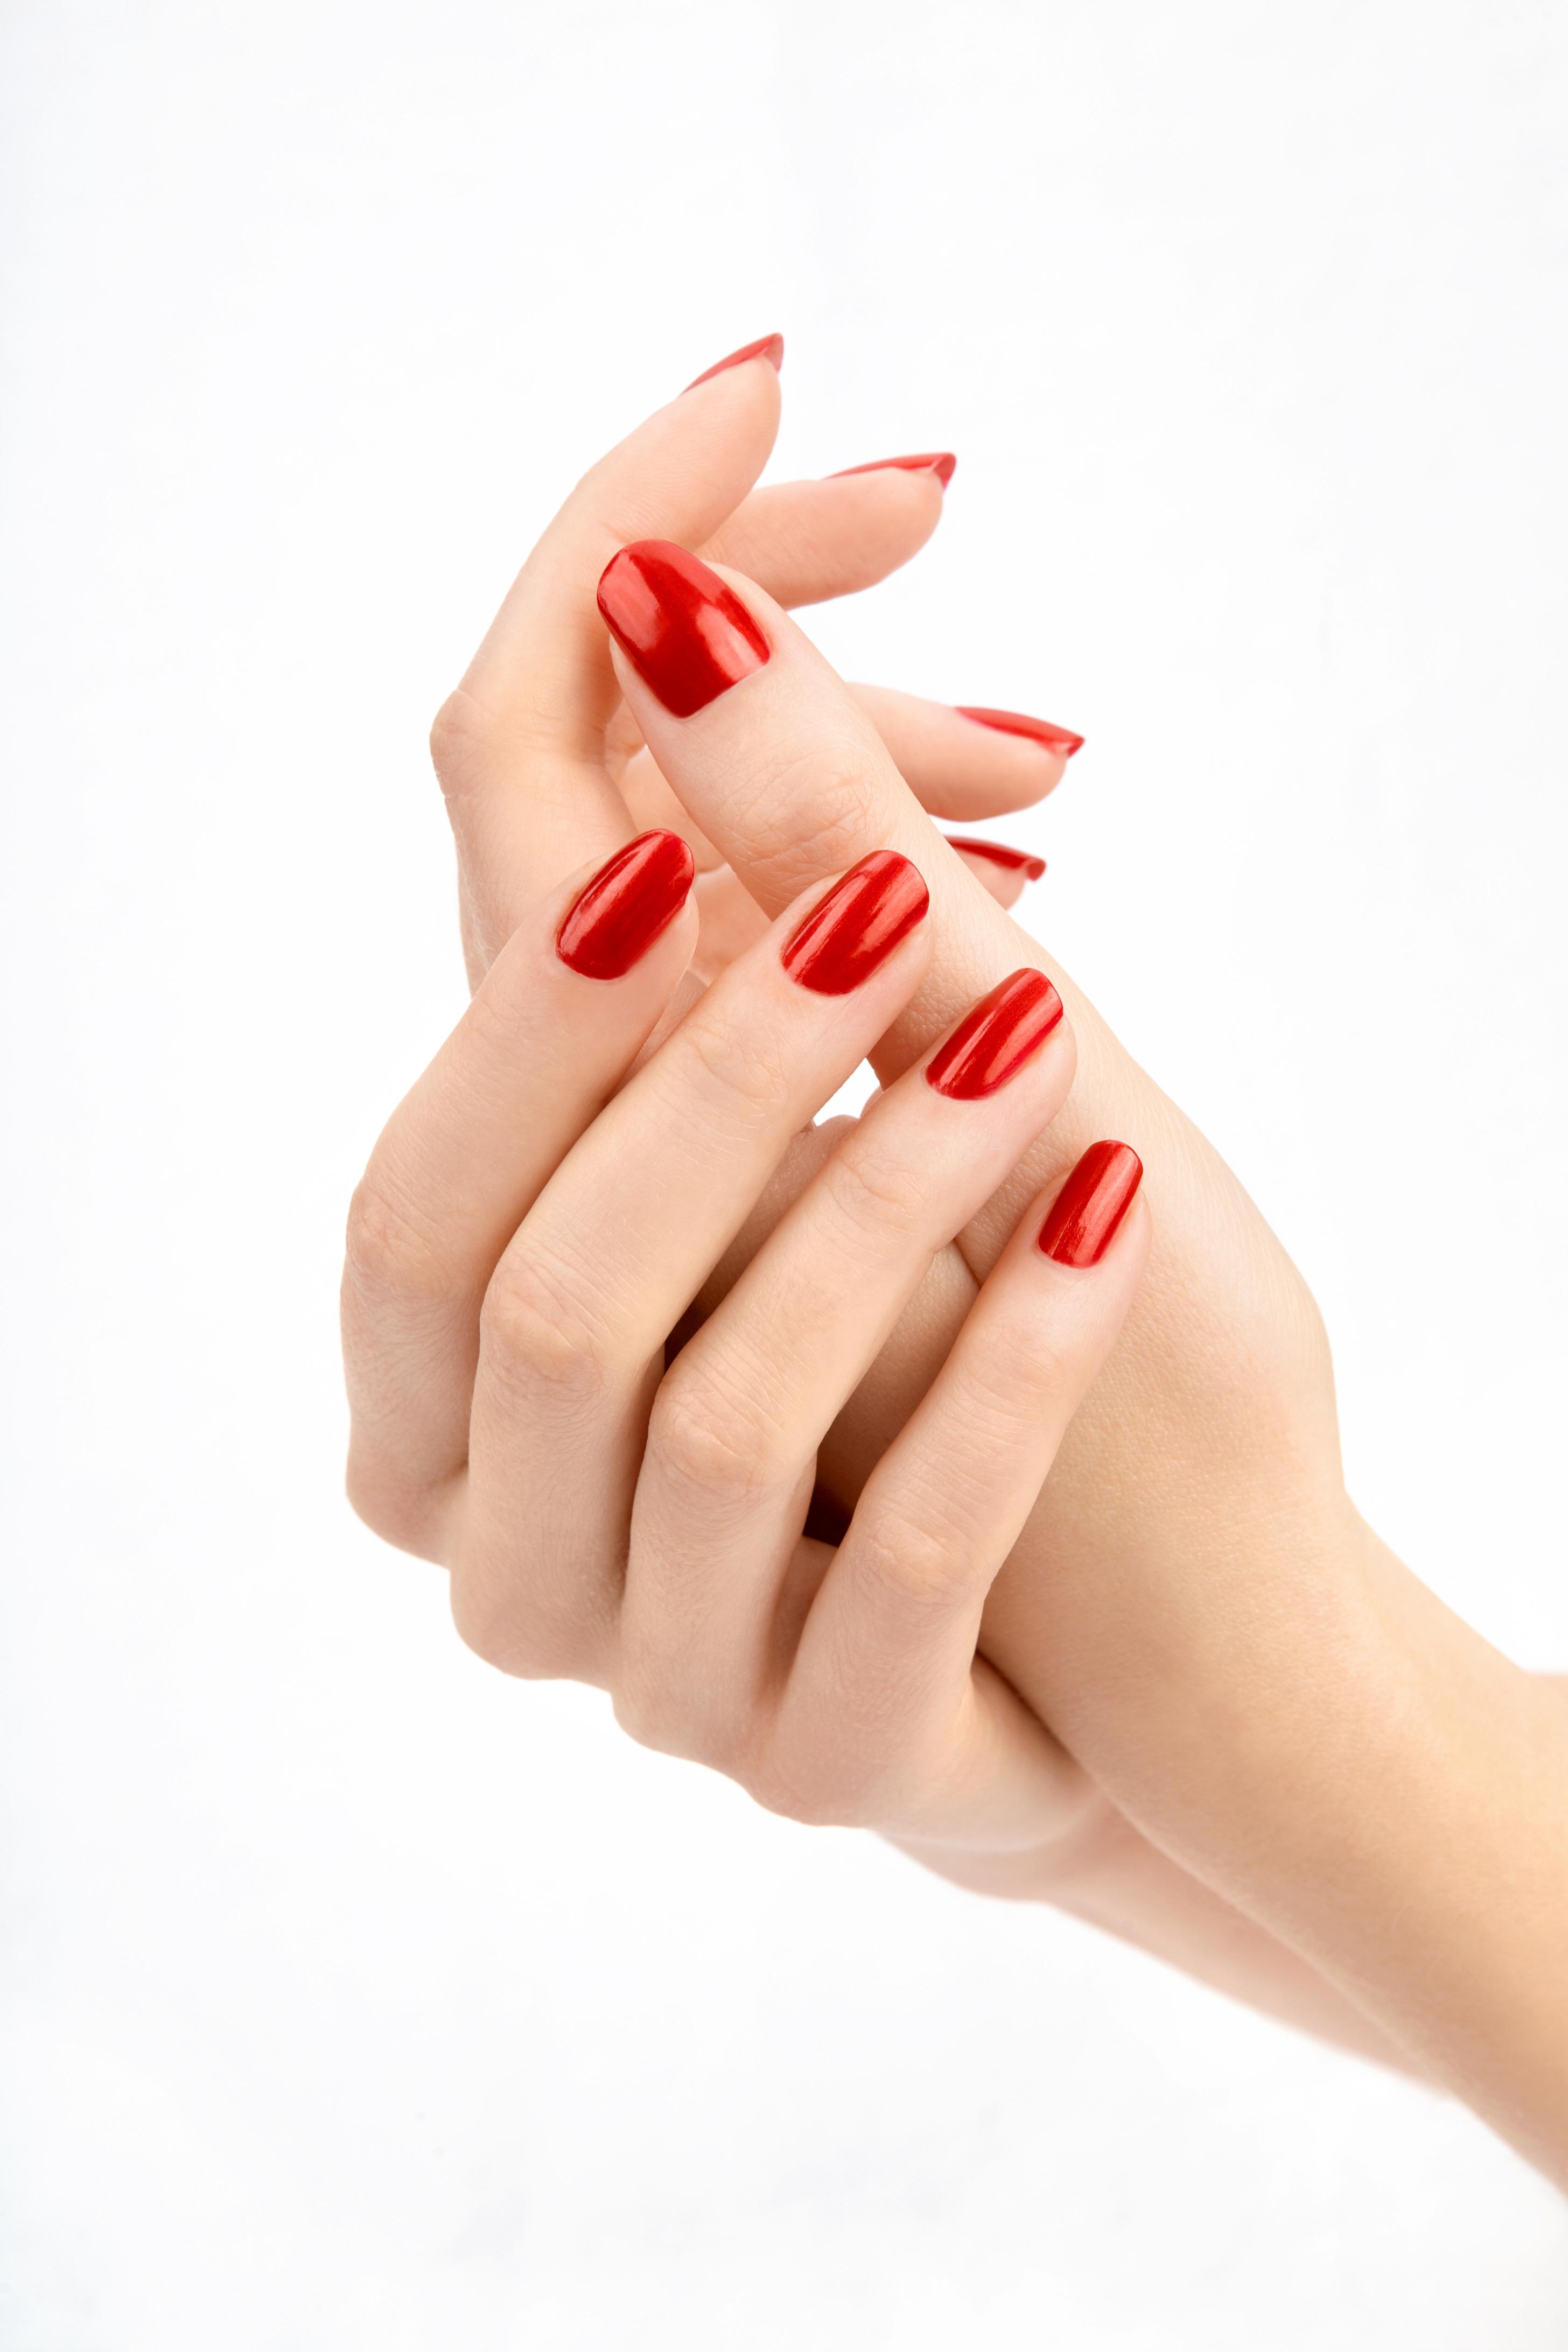 5 domowych sposób na zdrowe i piękne paznokcie!